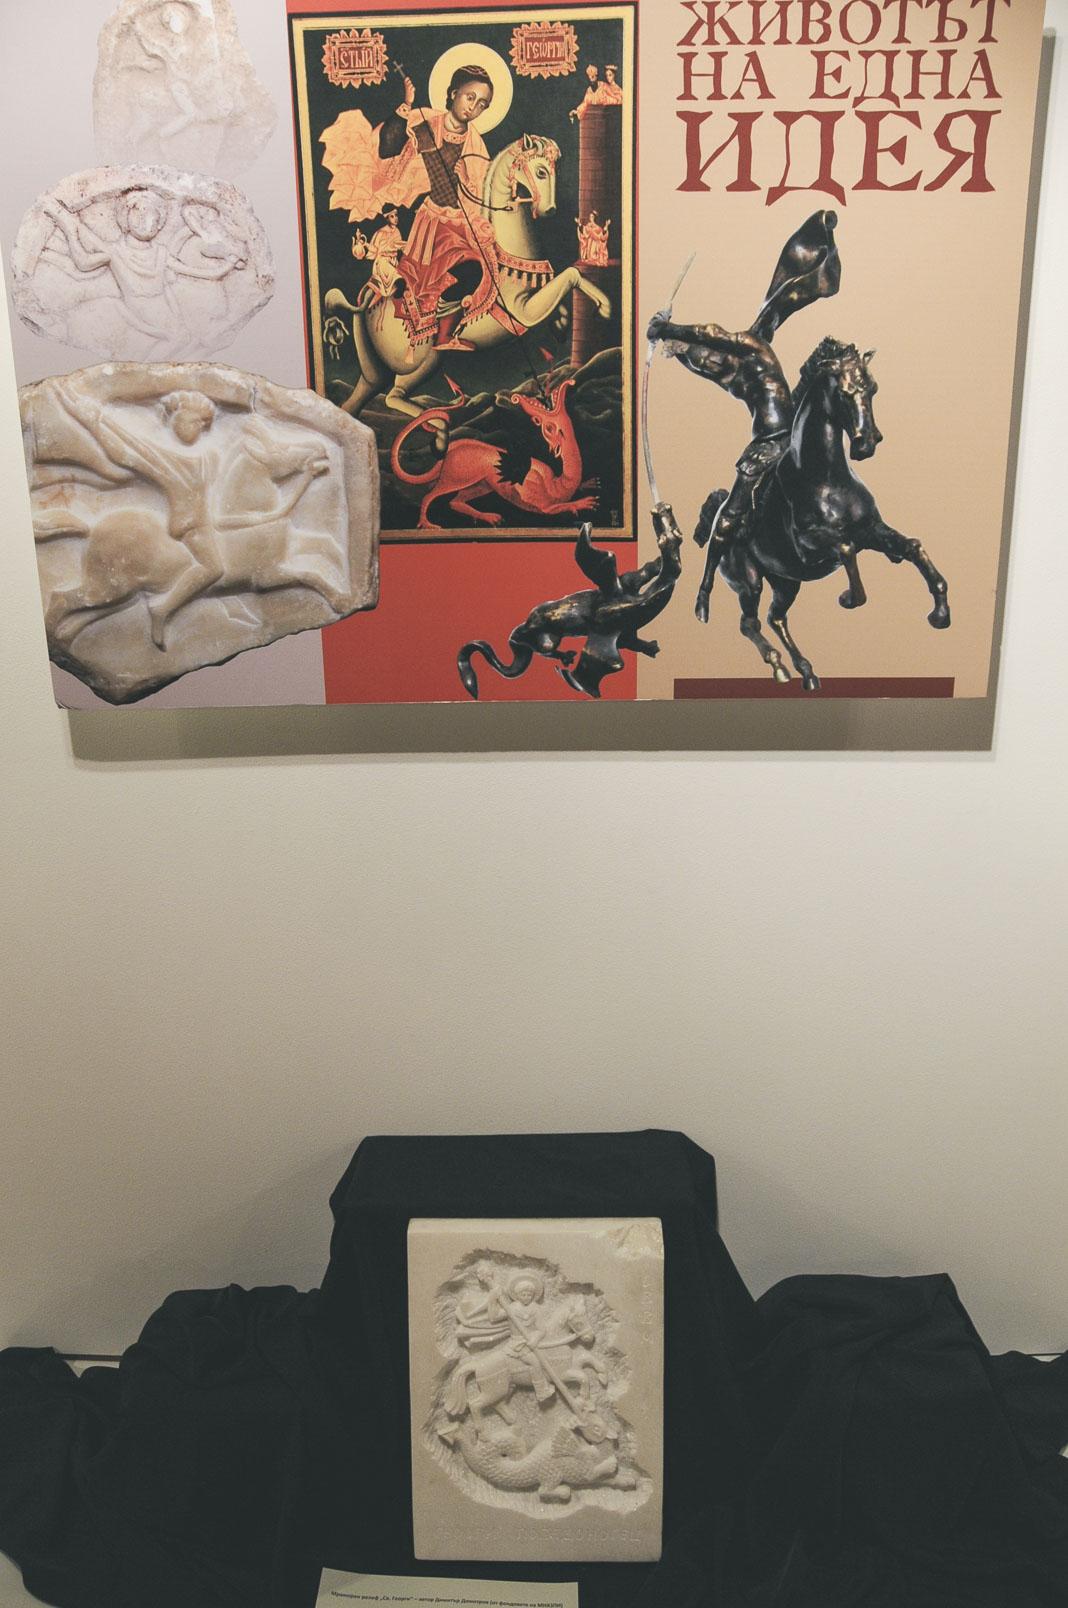 troyan-museum-jivotat-na-edna-idea-6